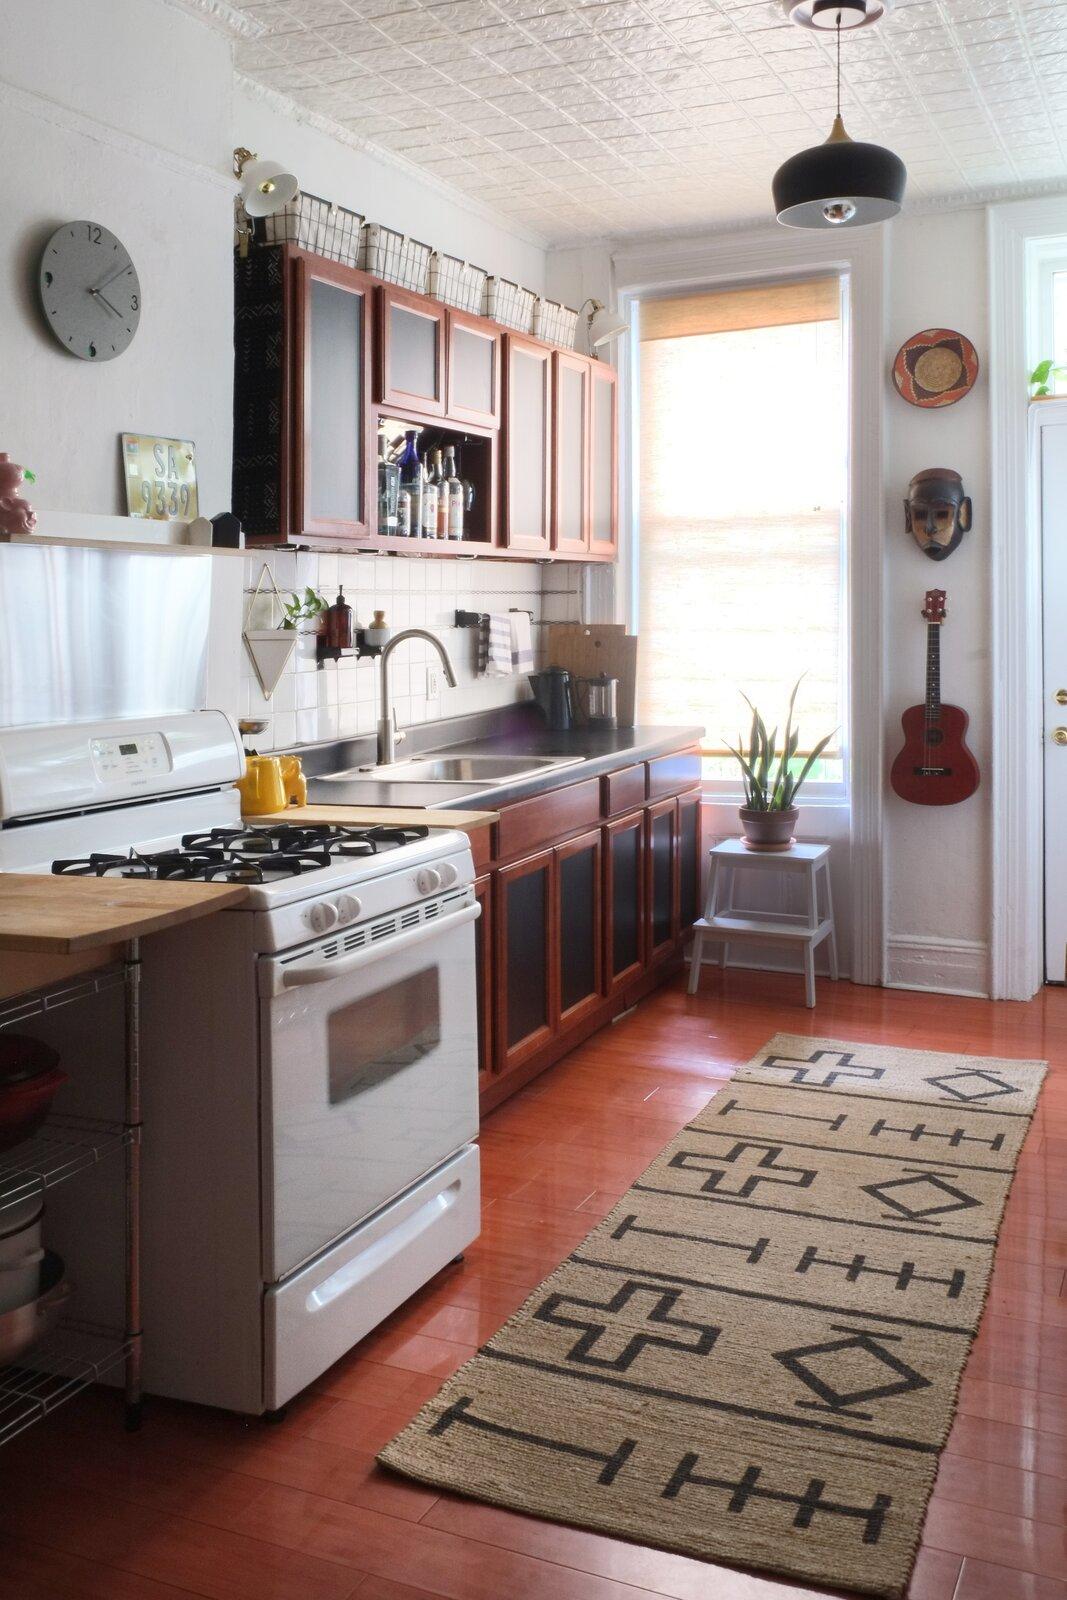 Queens rental apartment by Jordan Meerdink and Shalini Amin kitchen